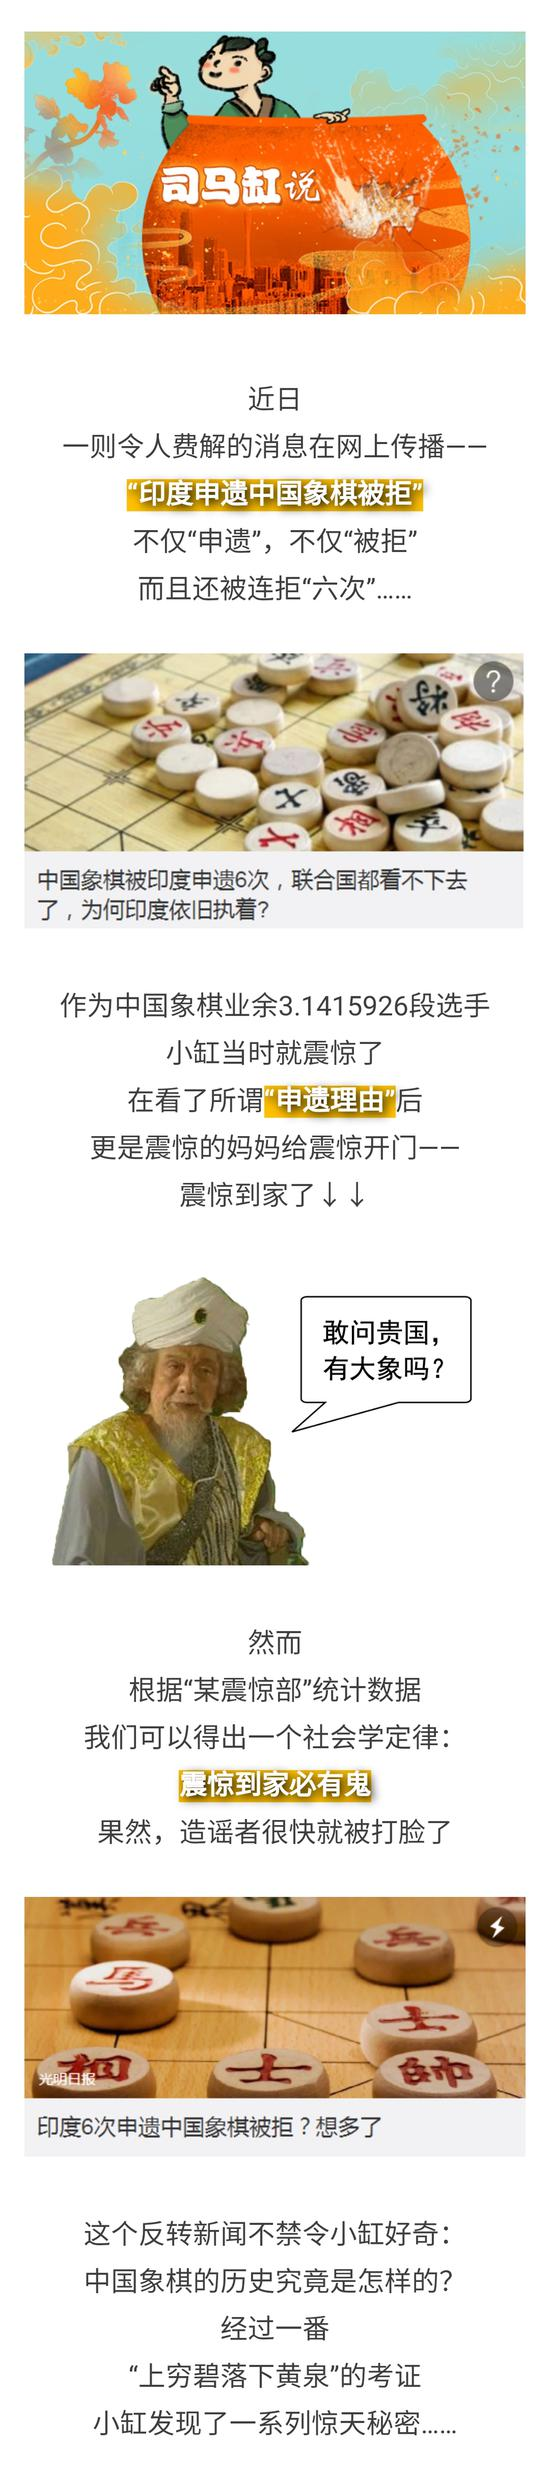 http://www.gzfjs.com/guojiguanzhu/335599.html